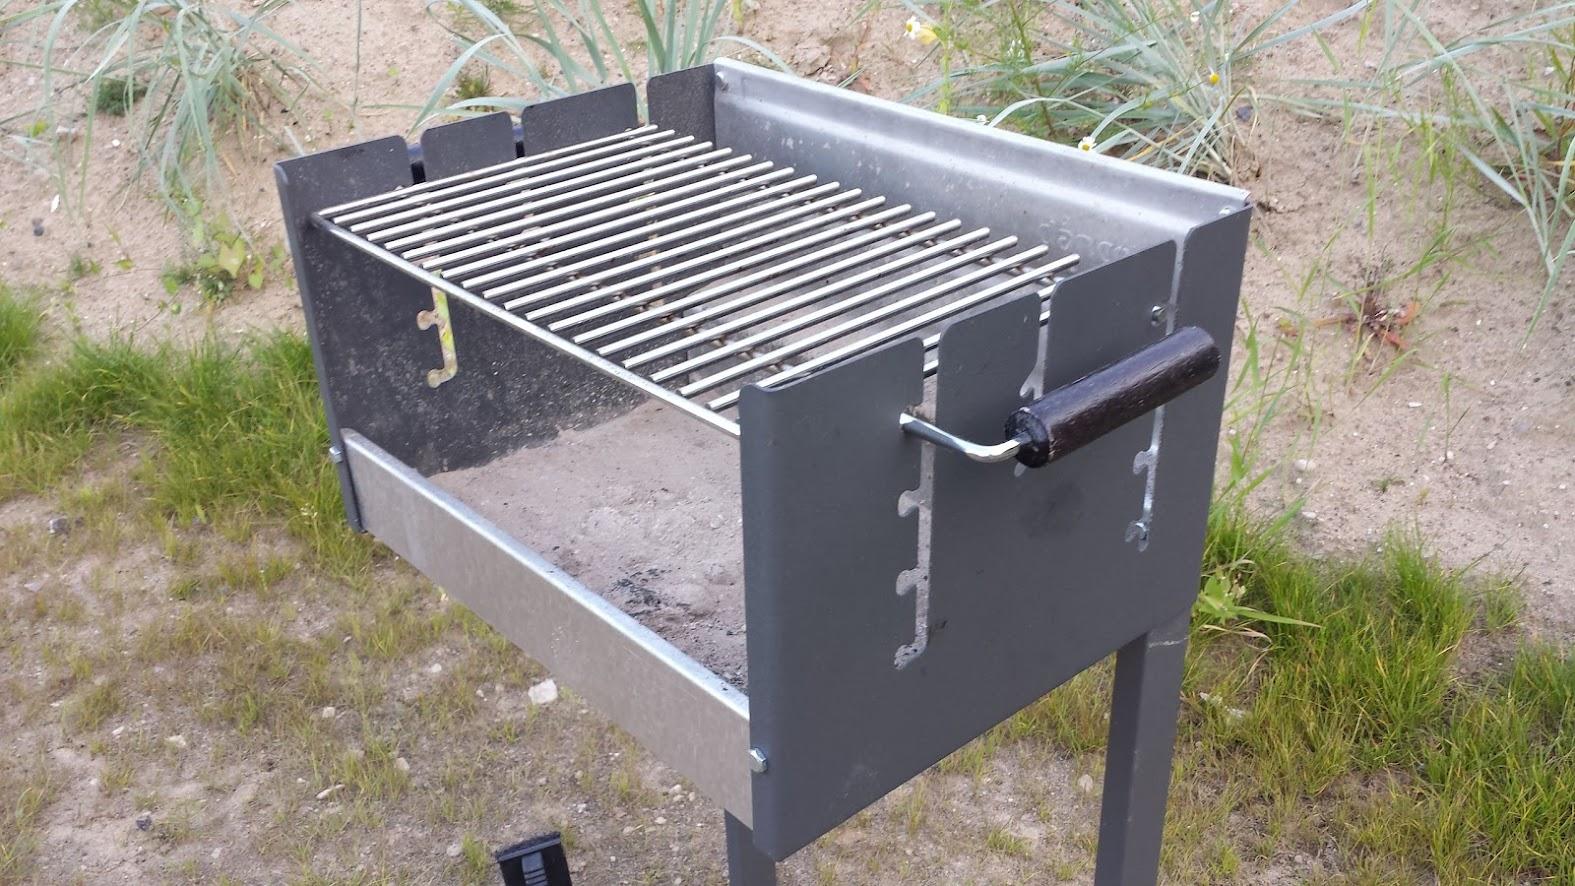 bratwursten op de dancook box grill 7000. Black Bedroom Furniture Sets. Home Design Ideas